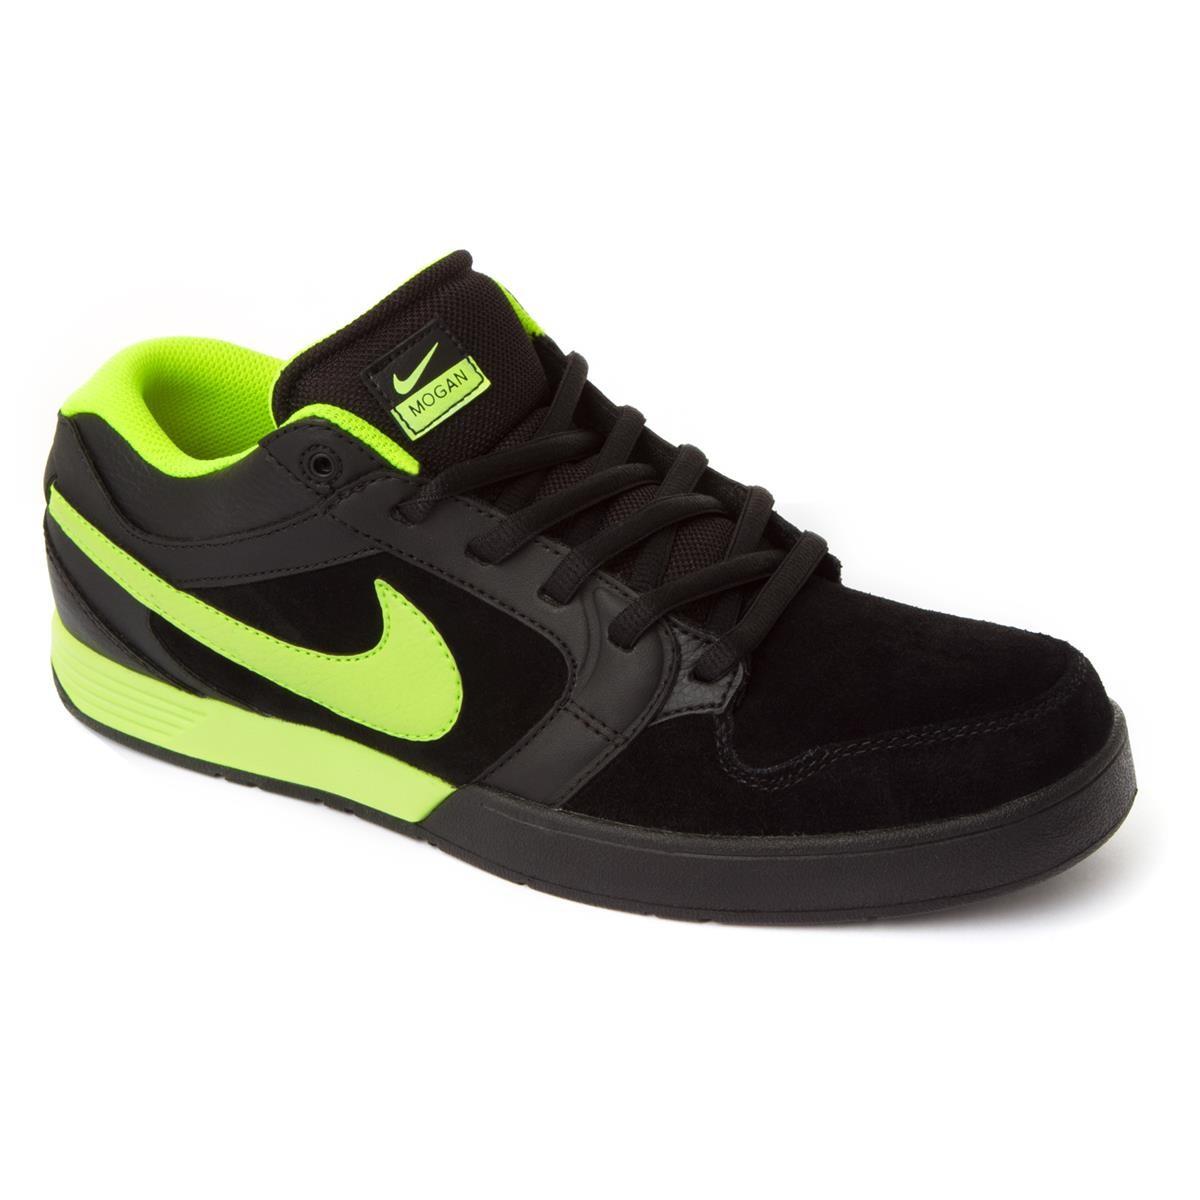 9a7b684a281e60 Nike 6.0 Schuhe Mogan 3 Black Volt-Black